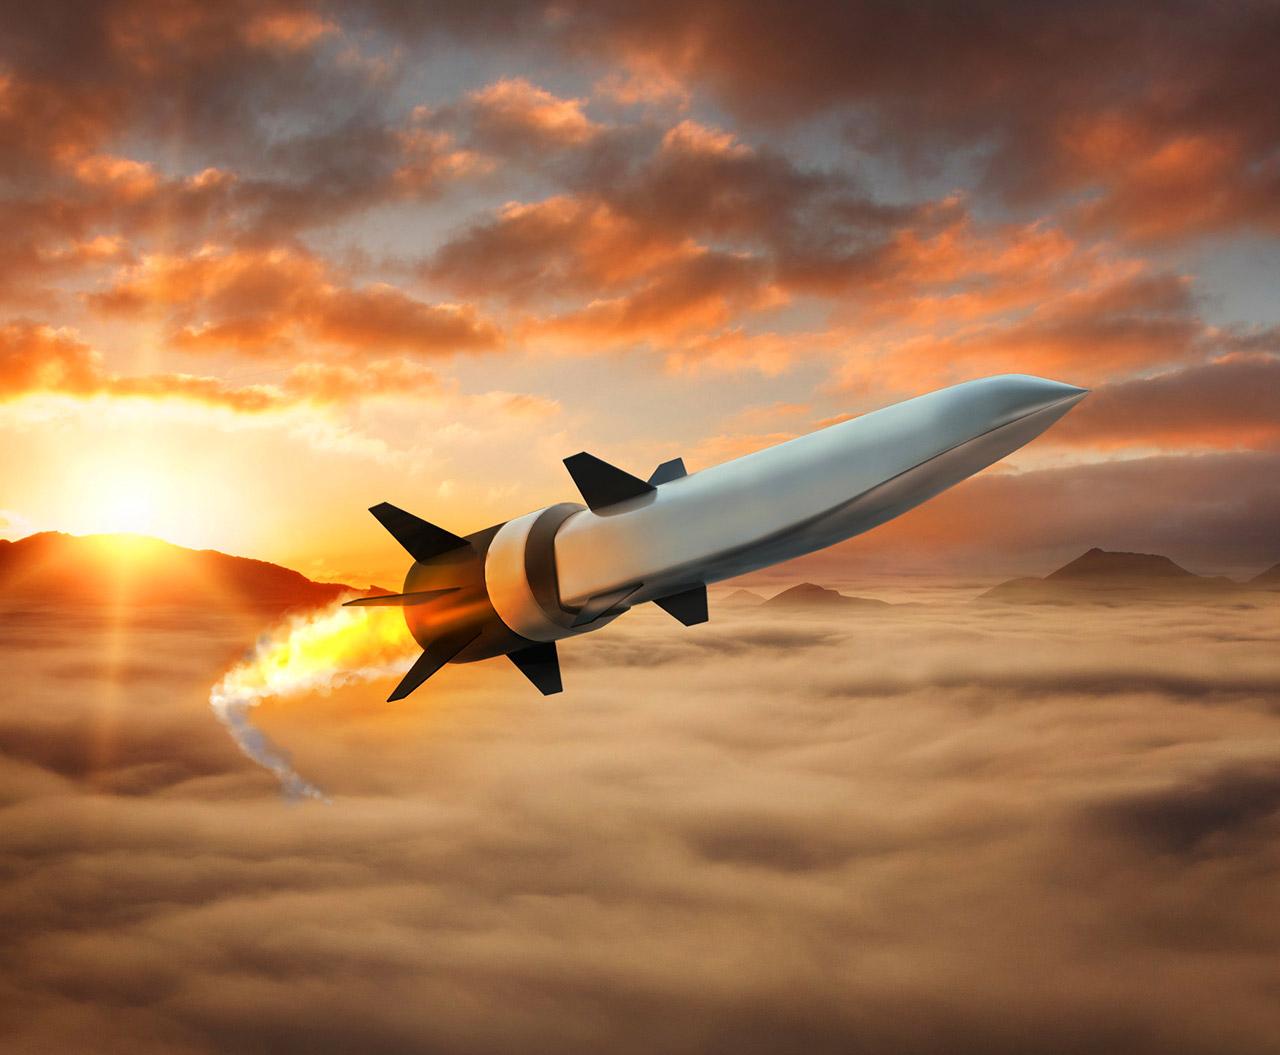 Raytheon Northrop Grumman Scramjet Hypersonic Weapon Missile